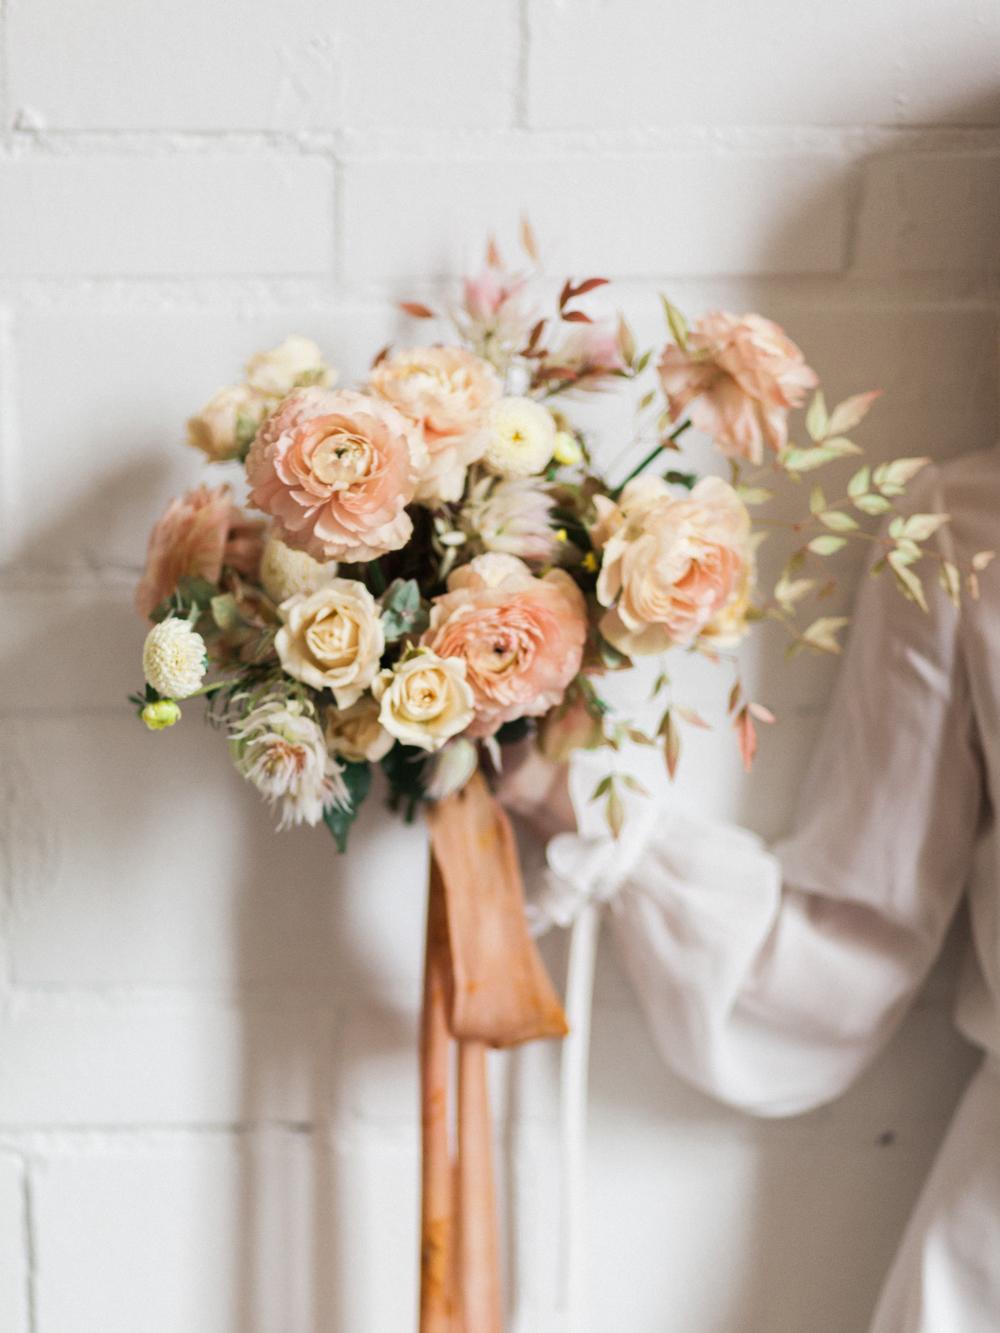 Christine Gosch - The Petaler - Houston fine art photographer - houston wedding florist-6.jpg